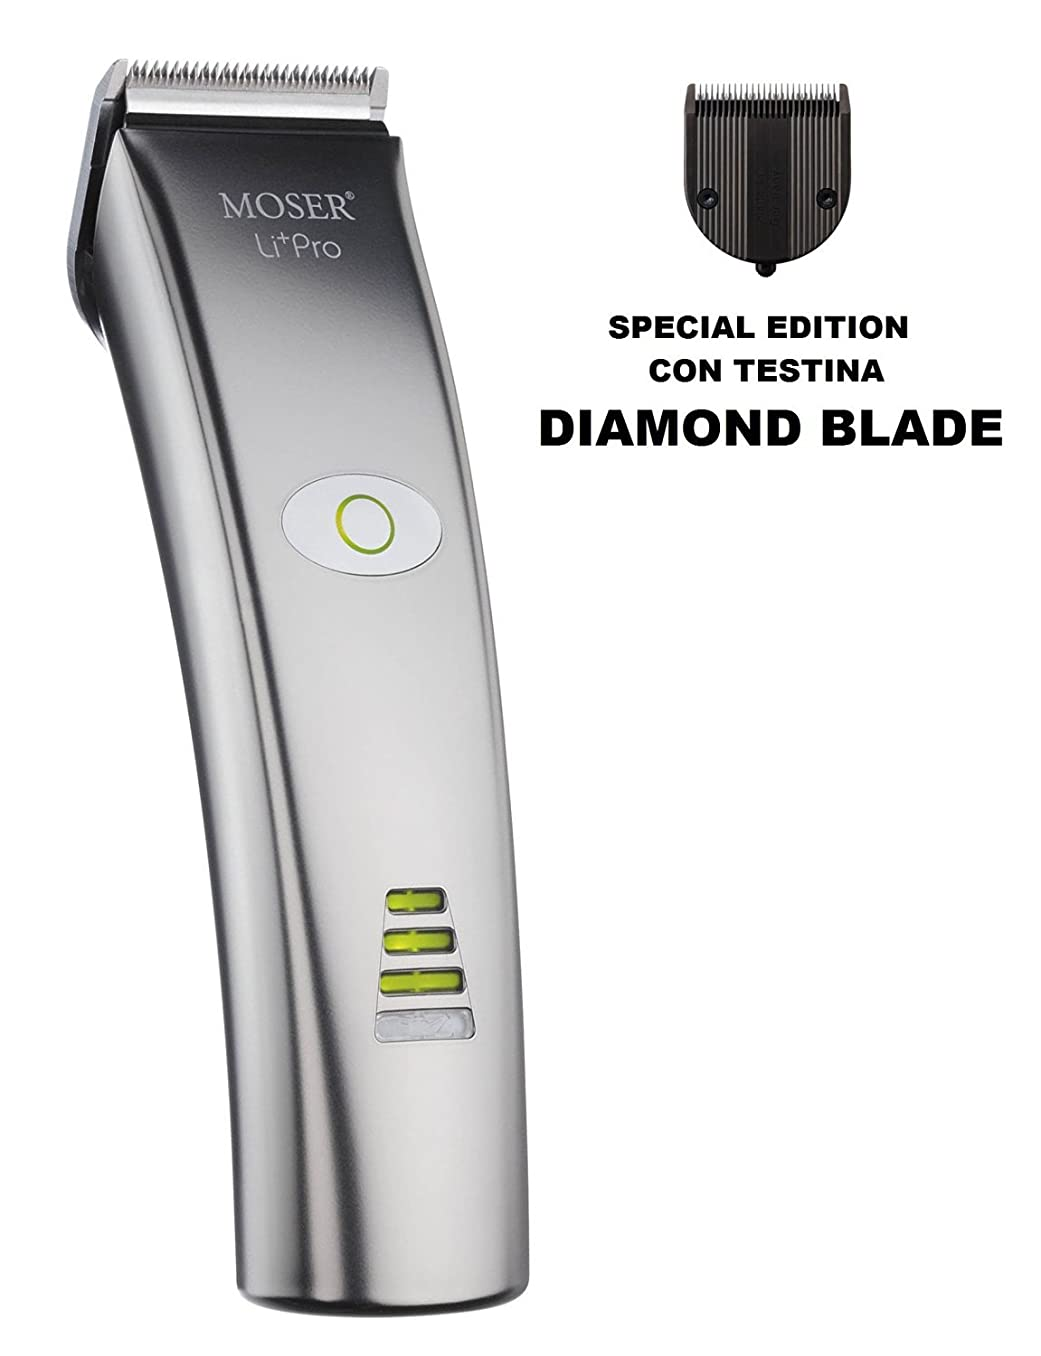 Moser 1884 LI+PRO Professional Cordless Hair Clipper Li-lon **Diamond Blade**